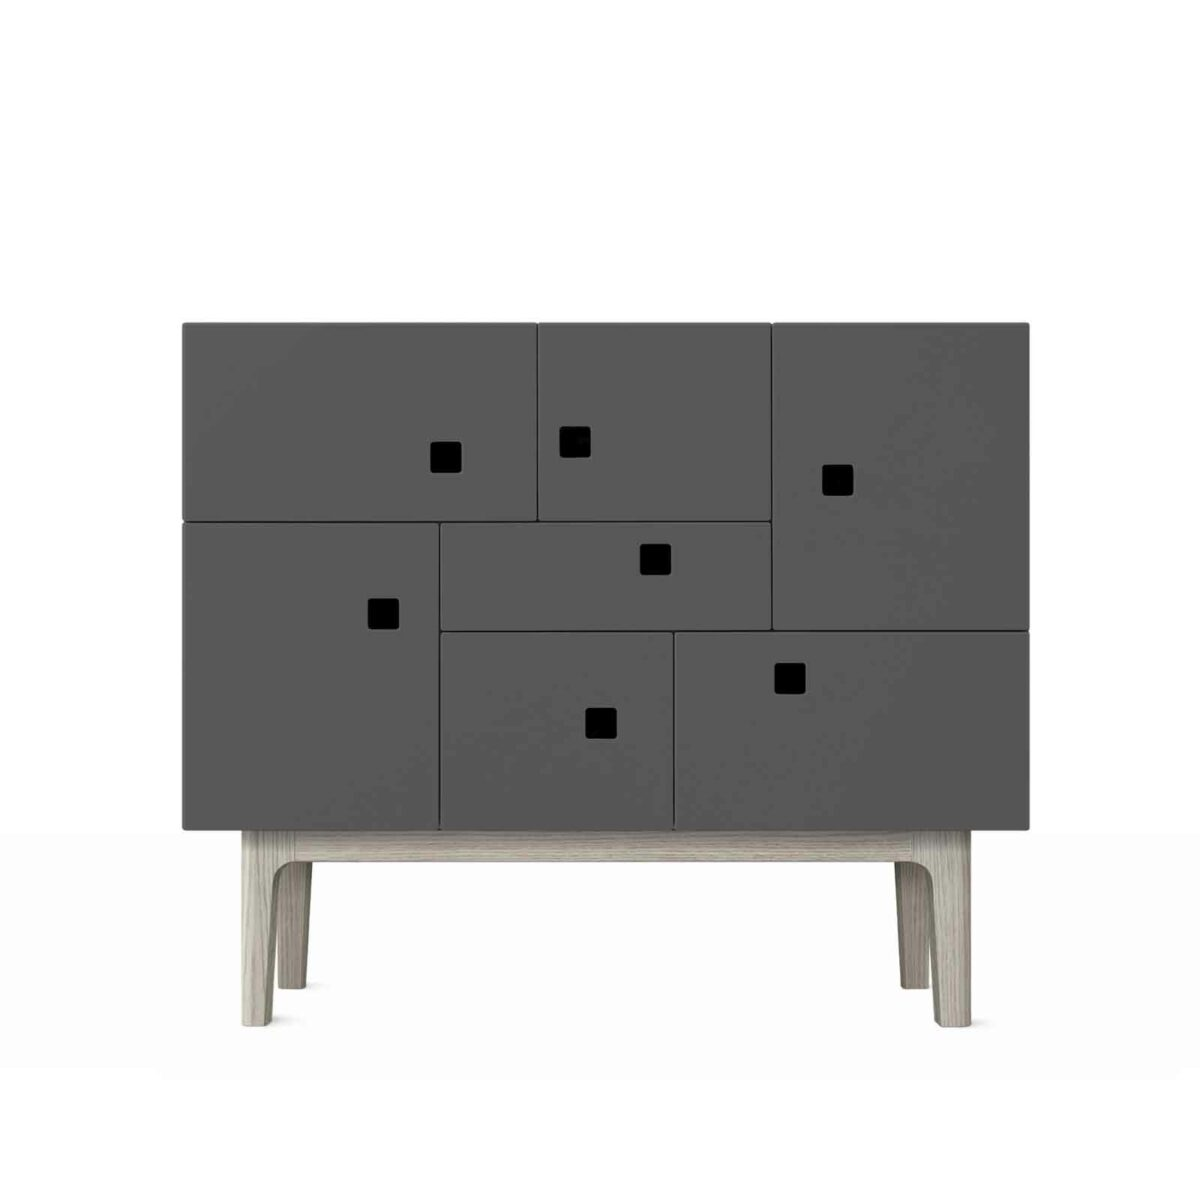 PEEP C1 grey oakbase